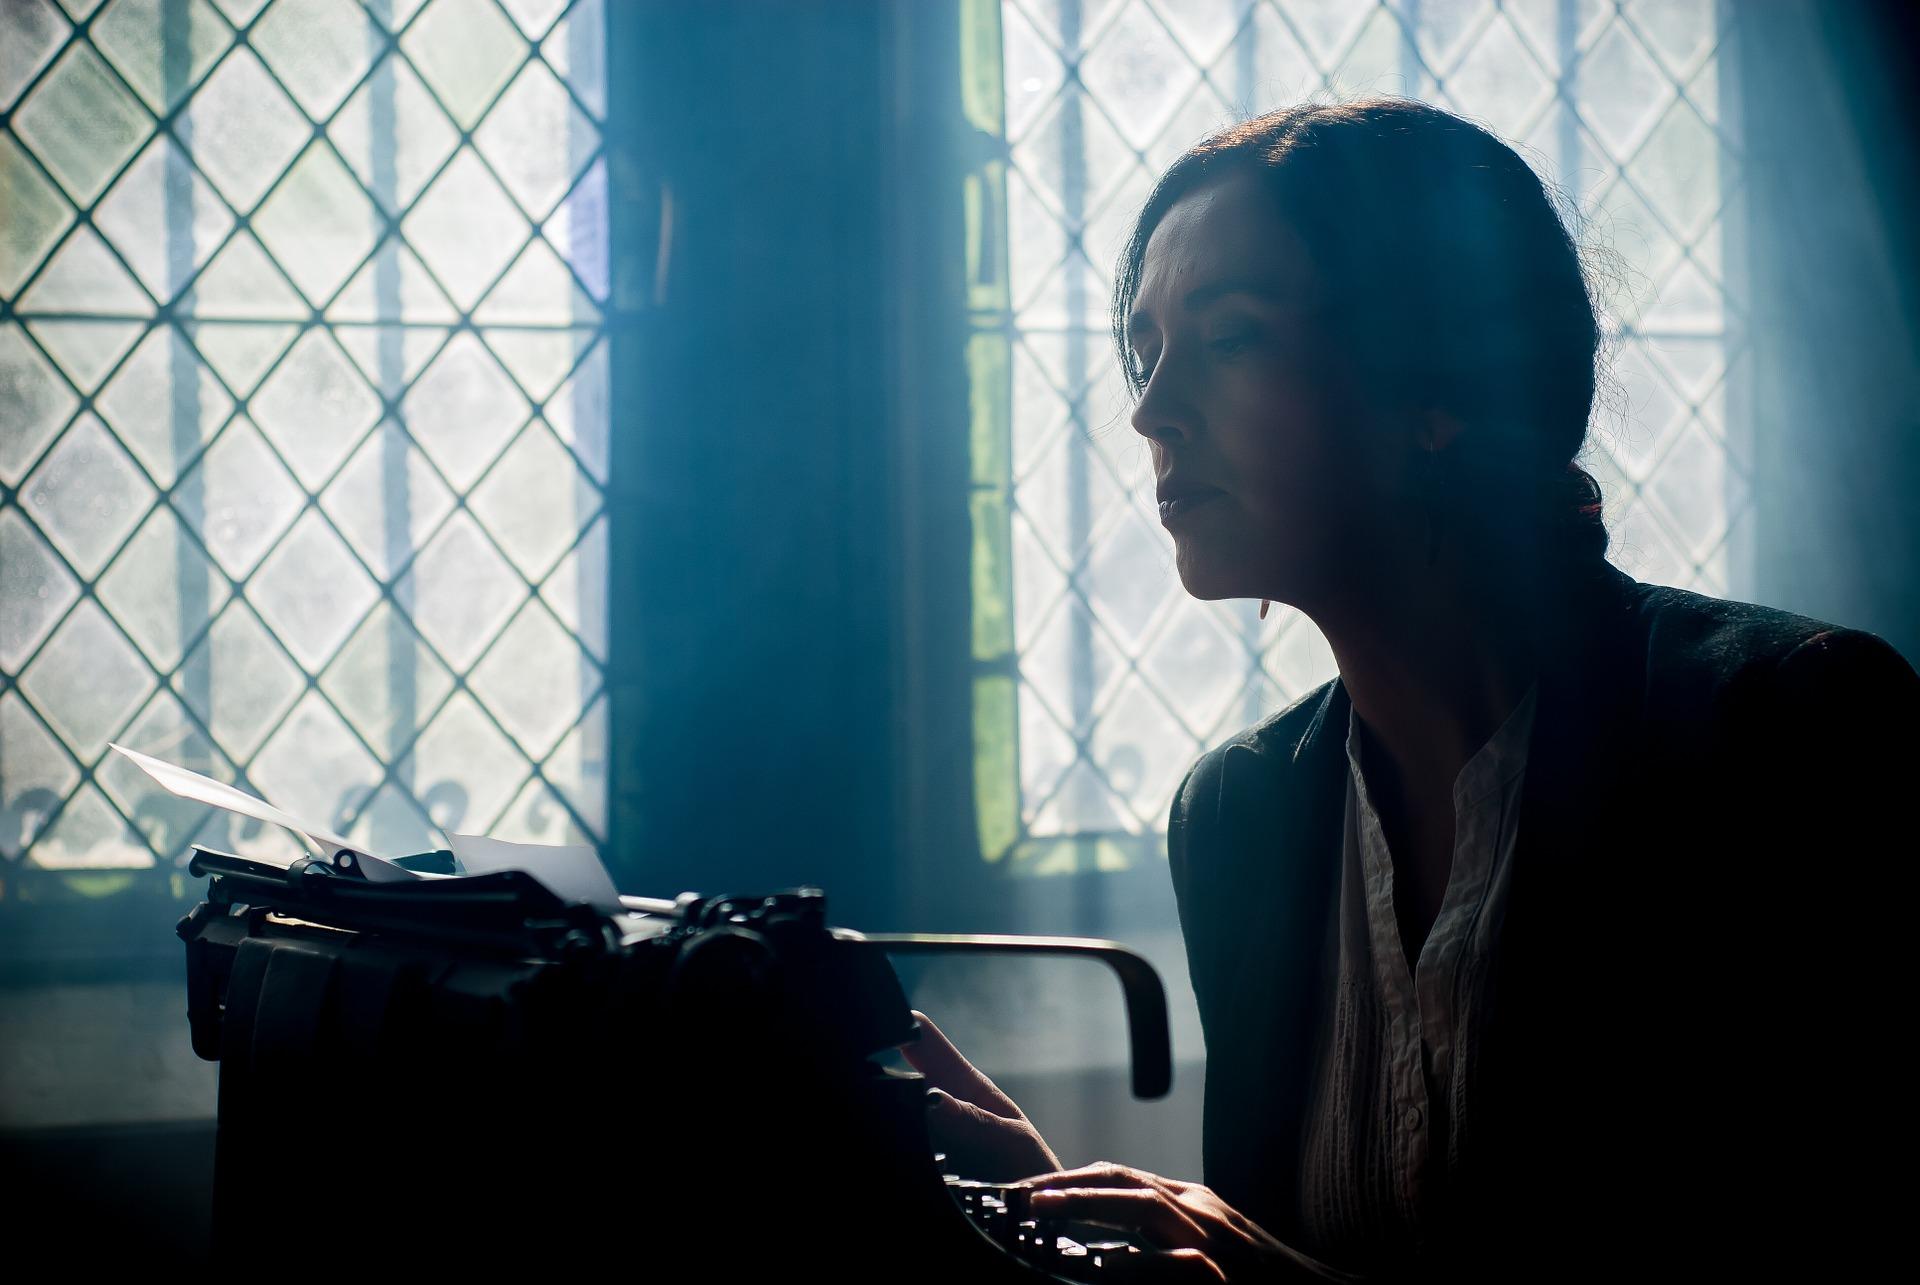 ¿Así que quieres ser escritor? CHARLES BUKOWSKI